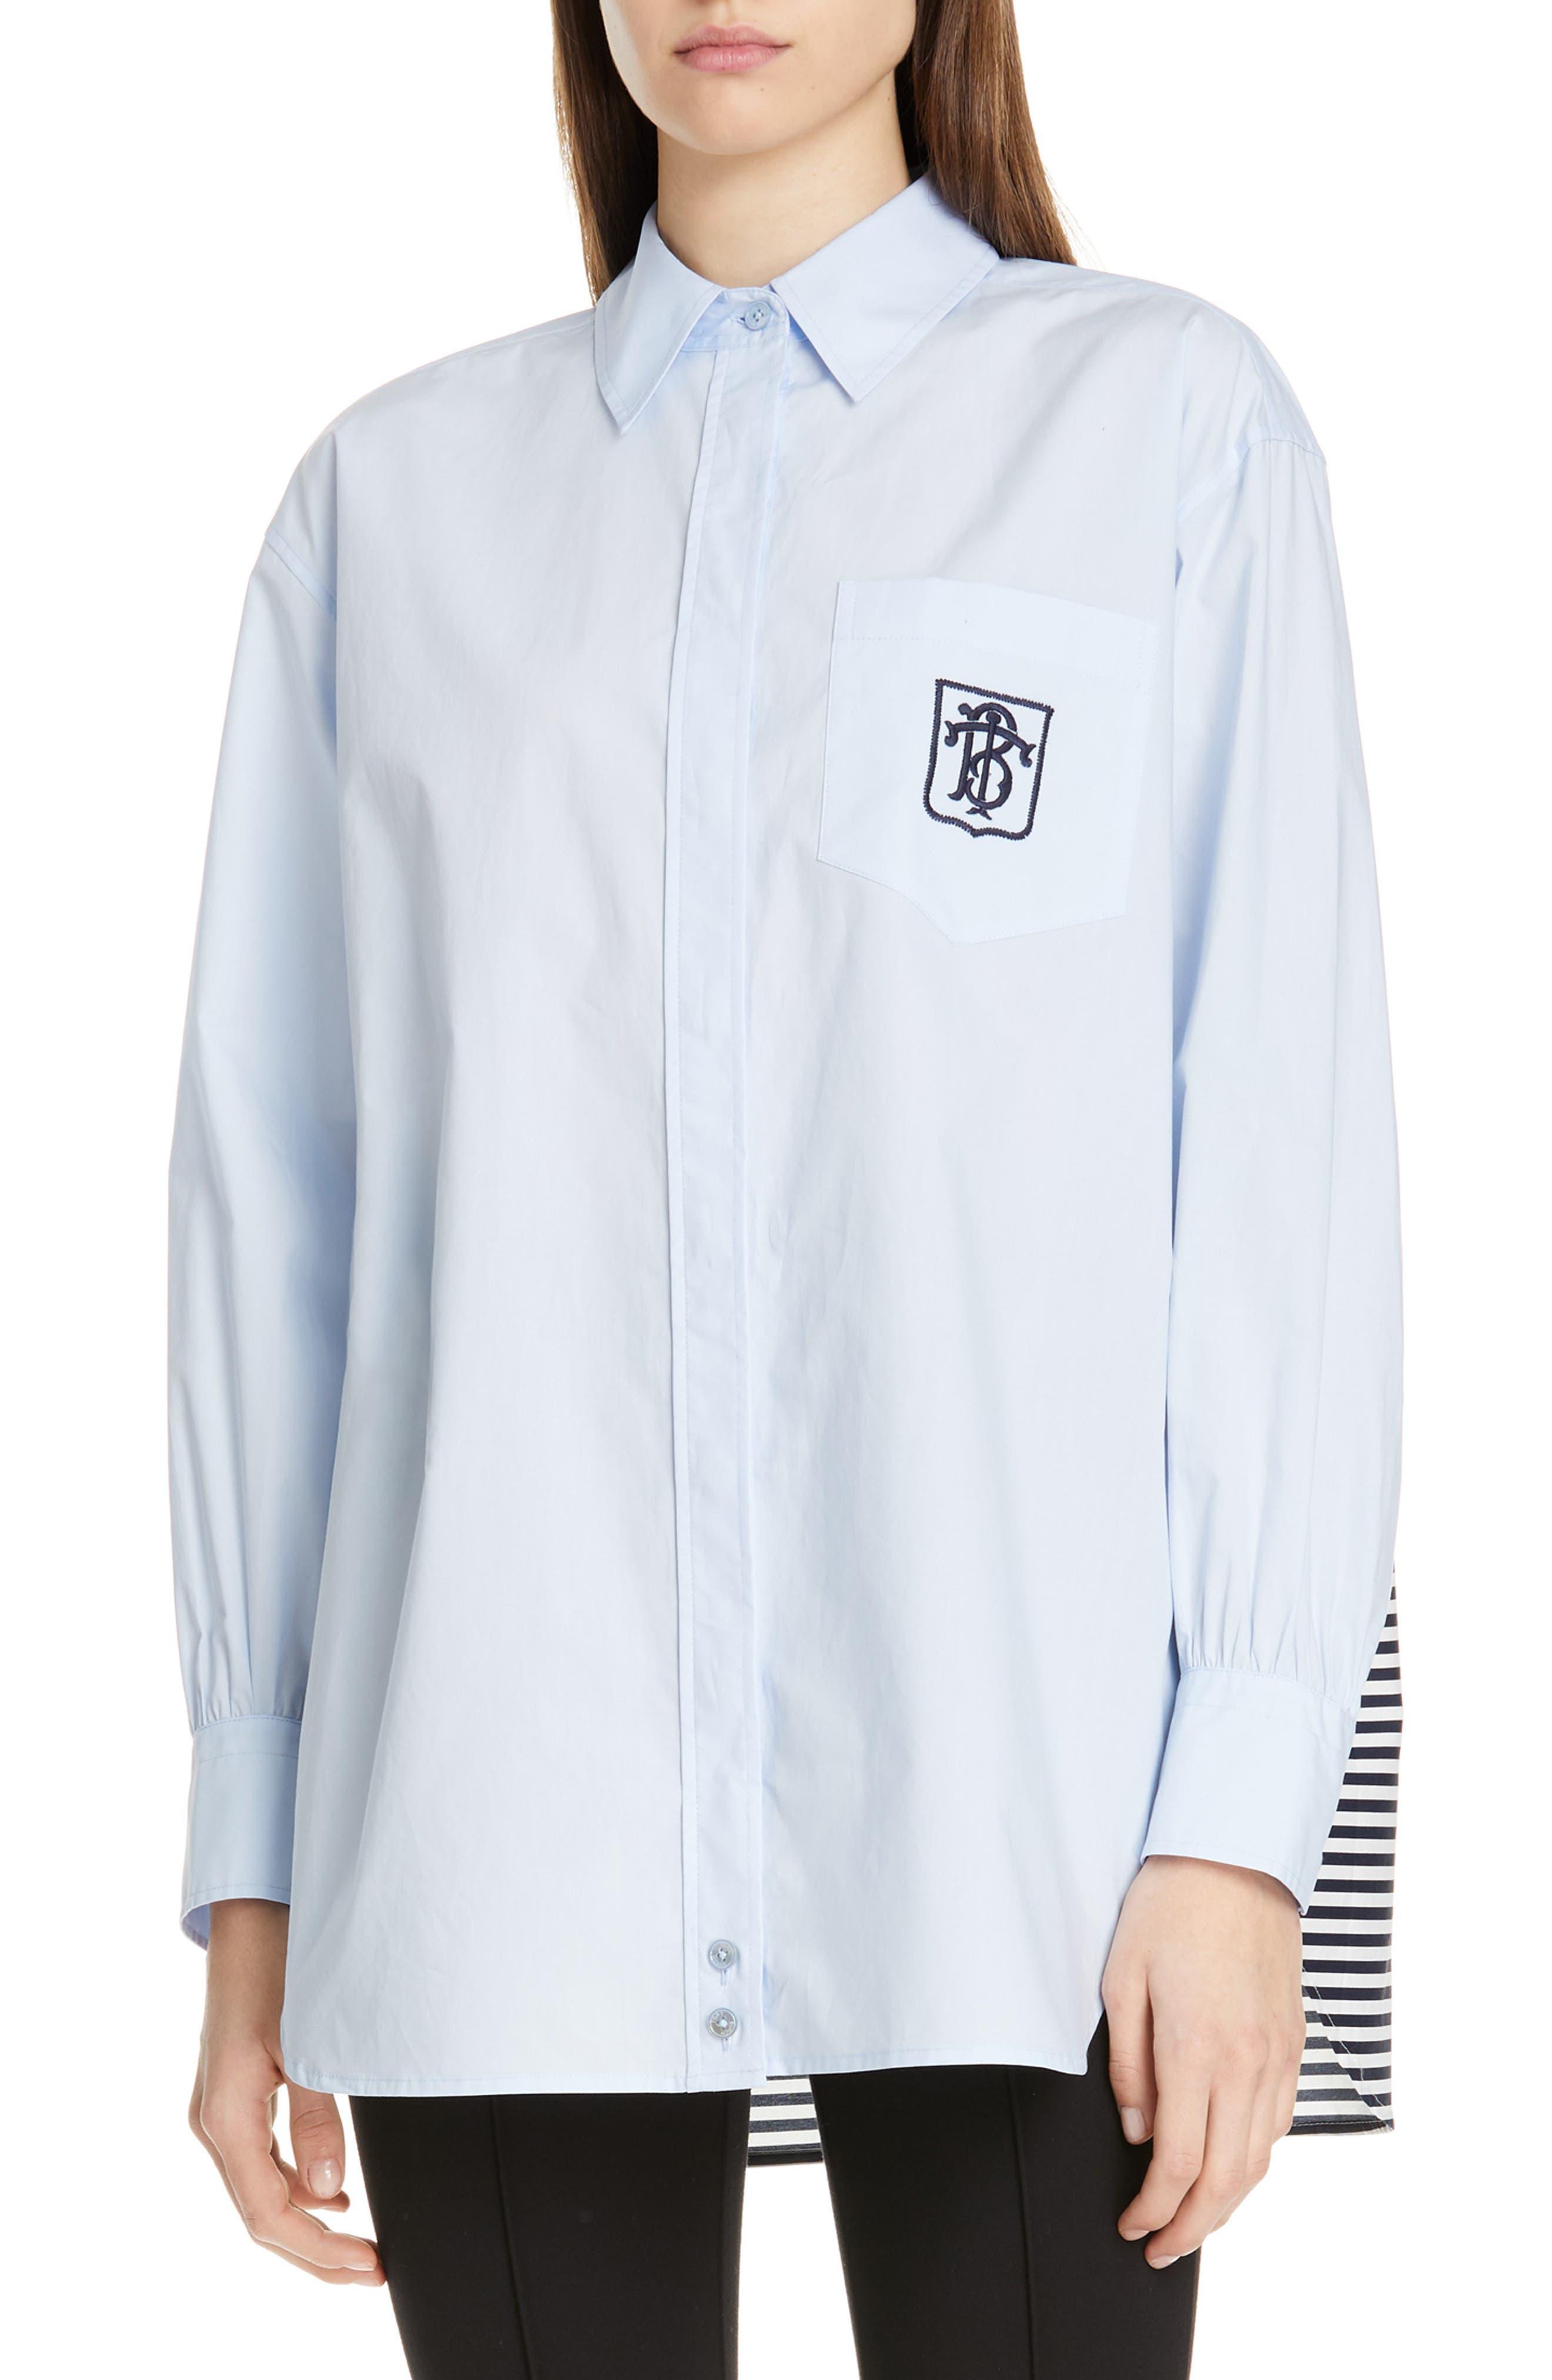 a3ae1b929de77 Shirts   Blouses Tory Burch Clothing